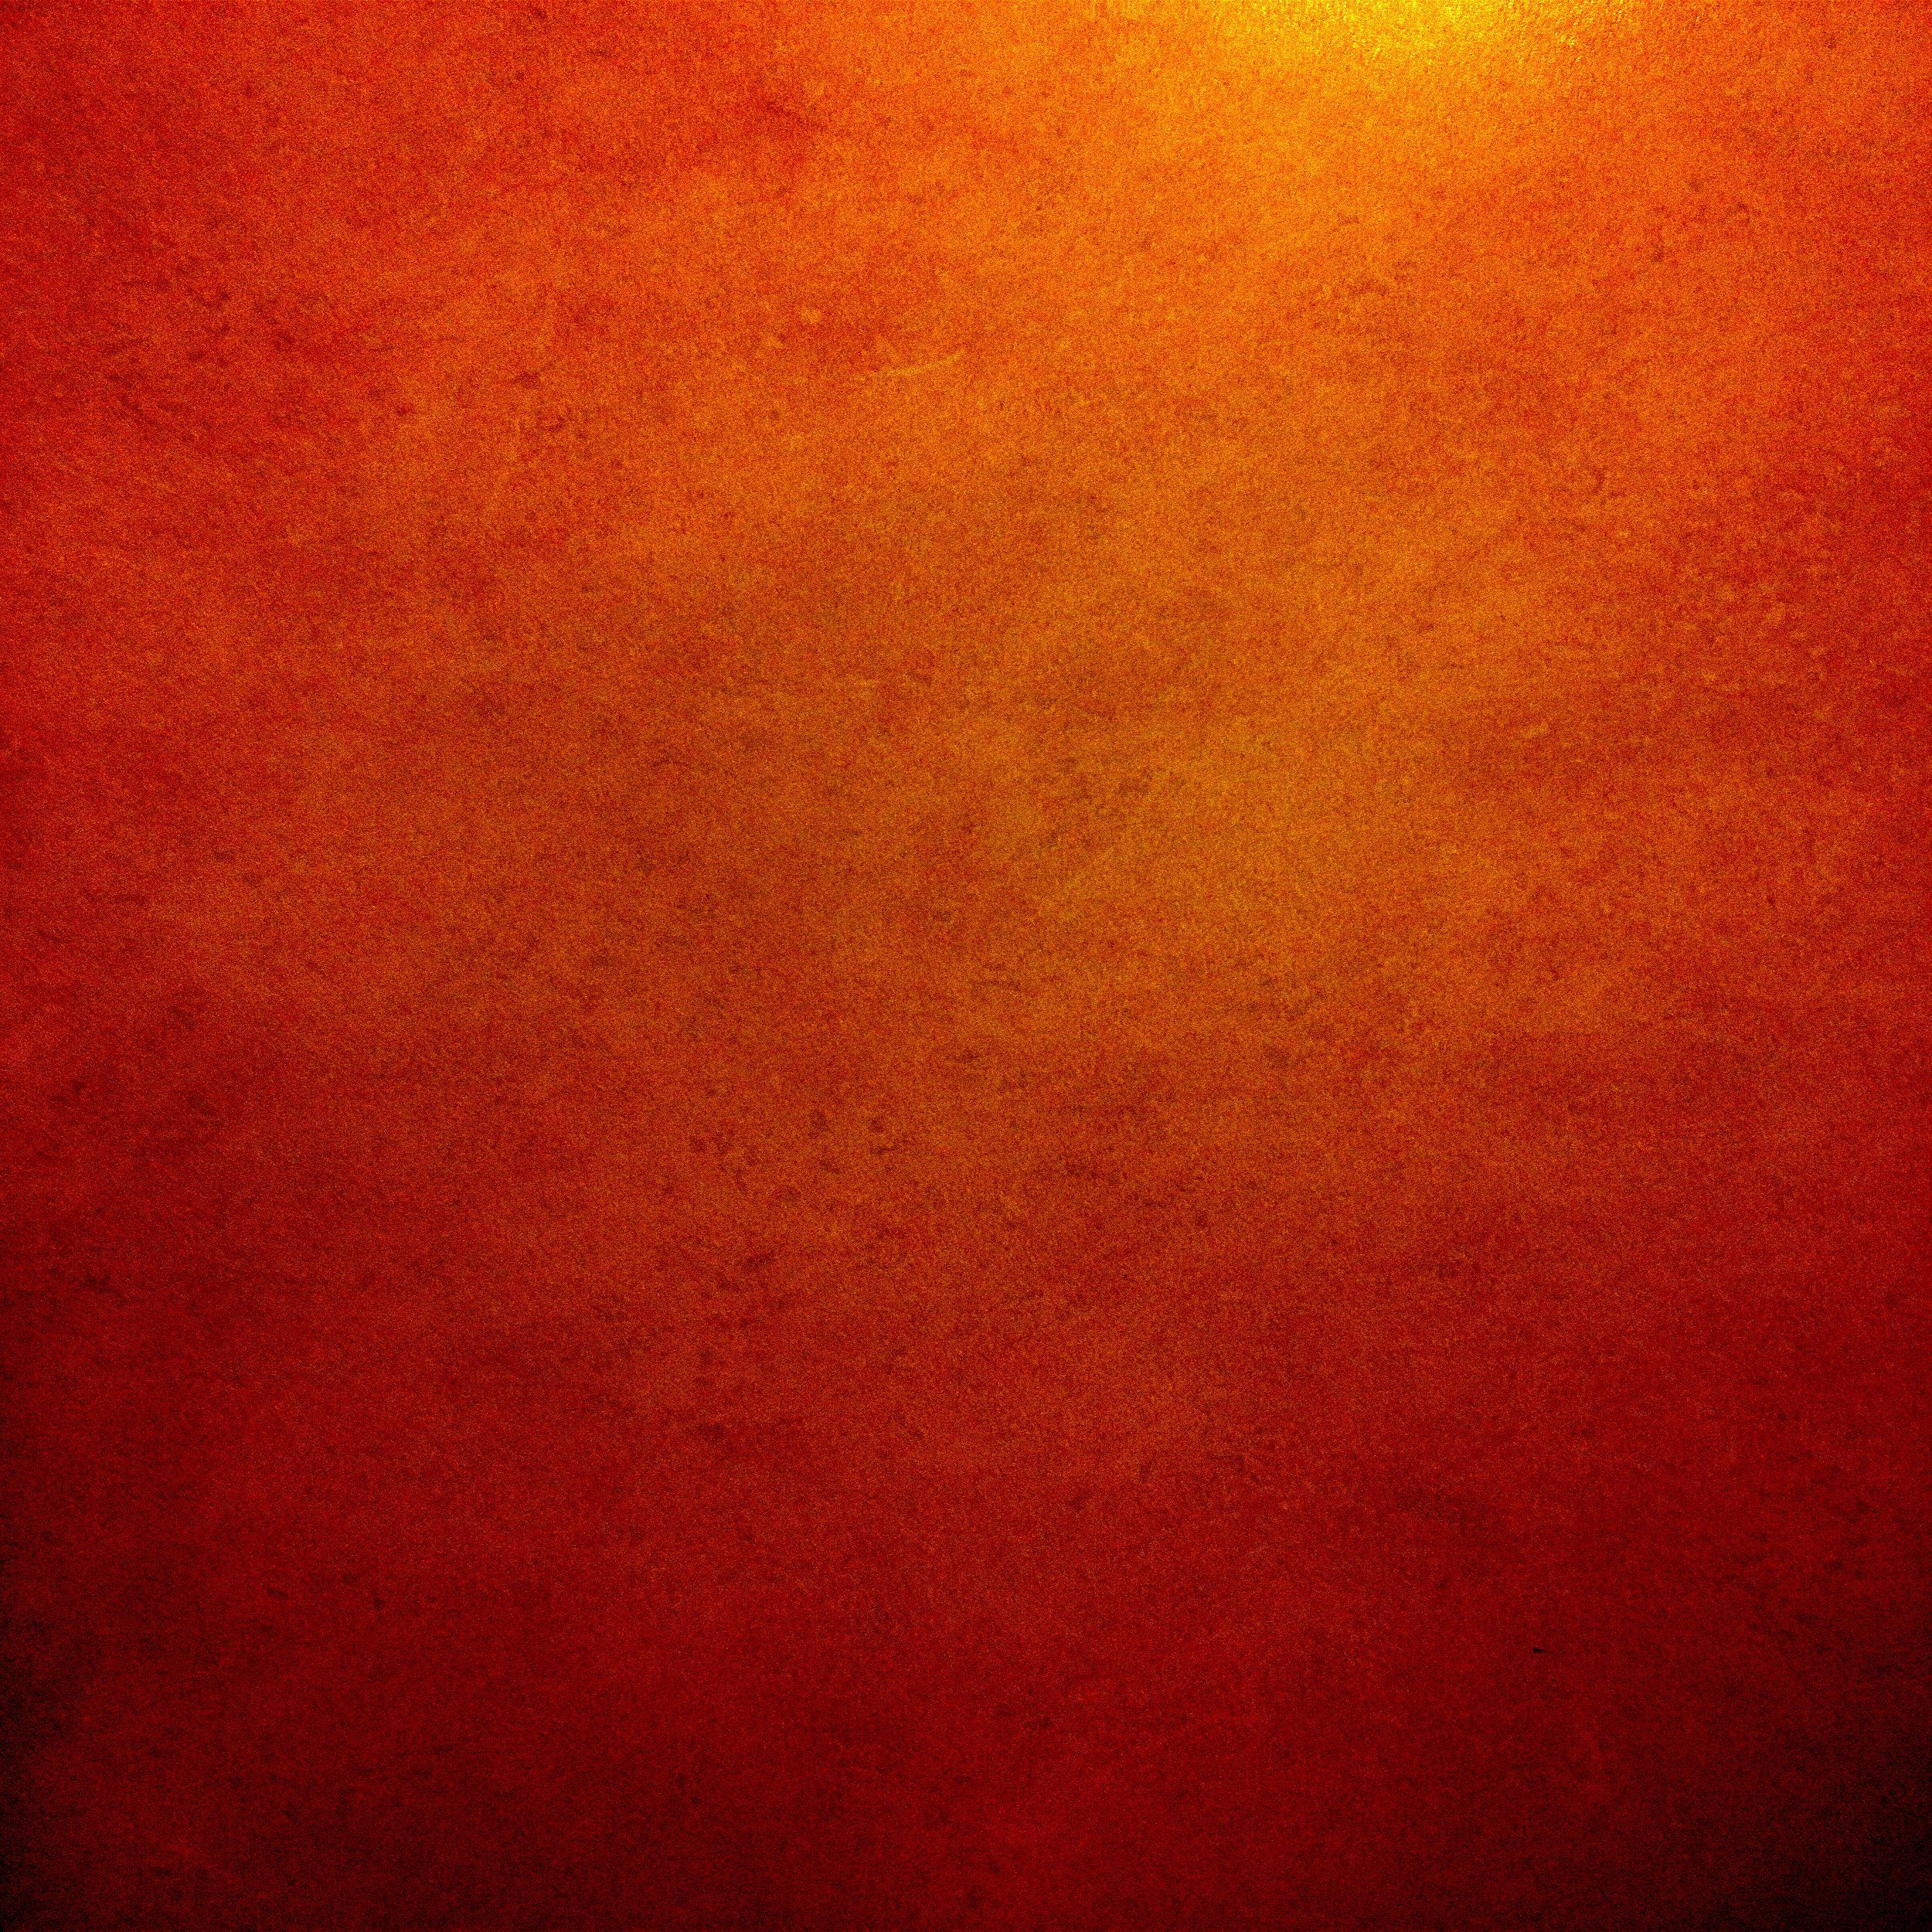 Image Gallery orange grunge backgrounds textures